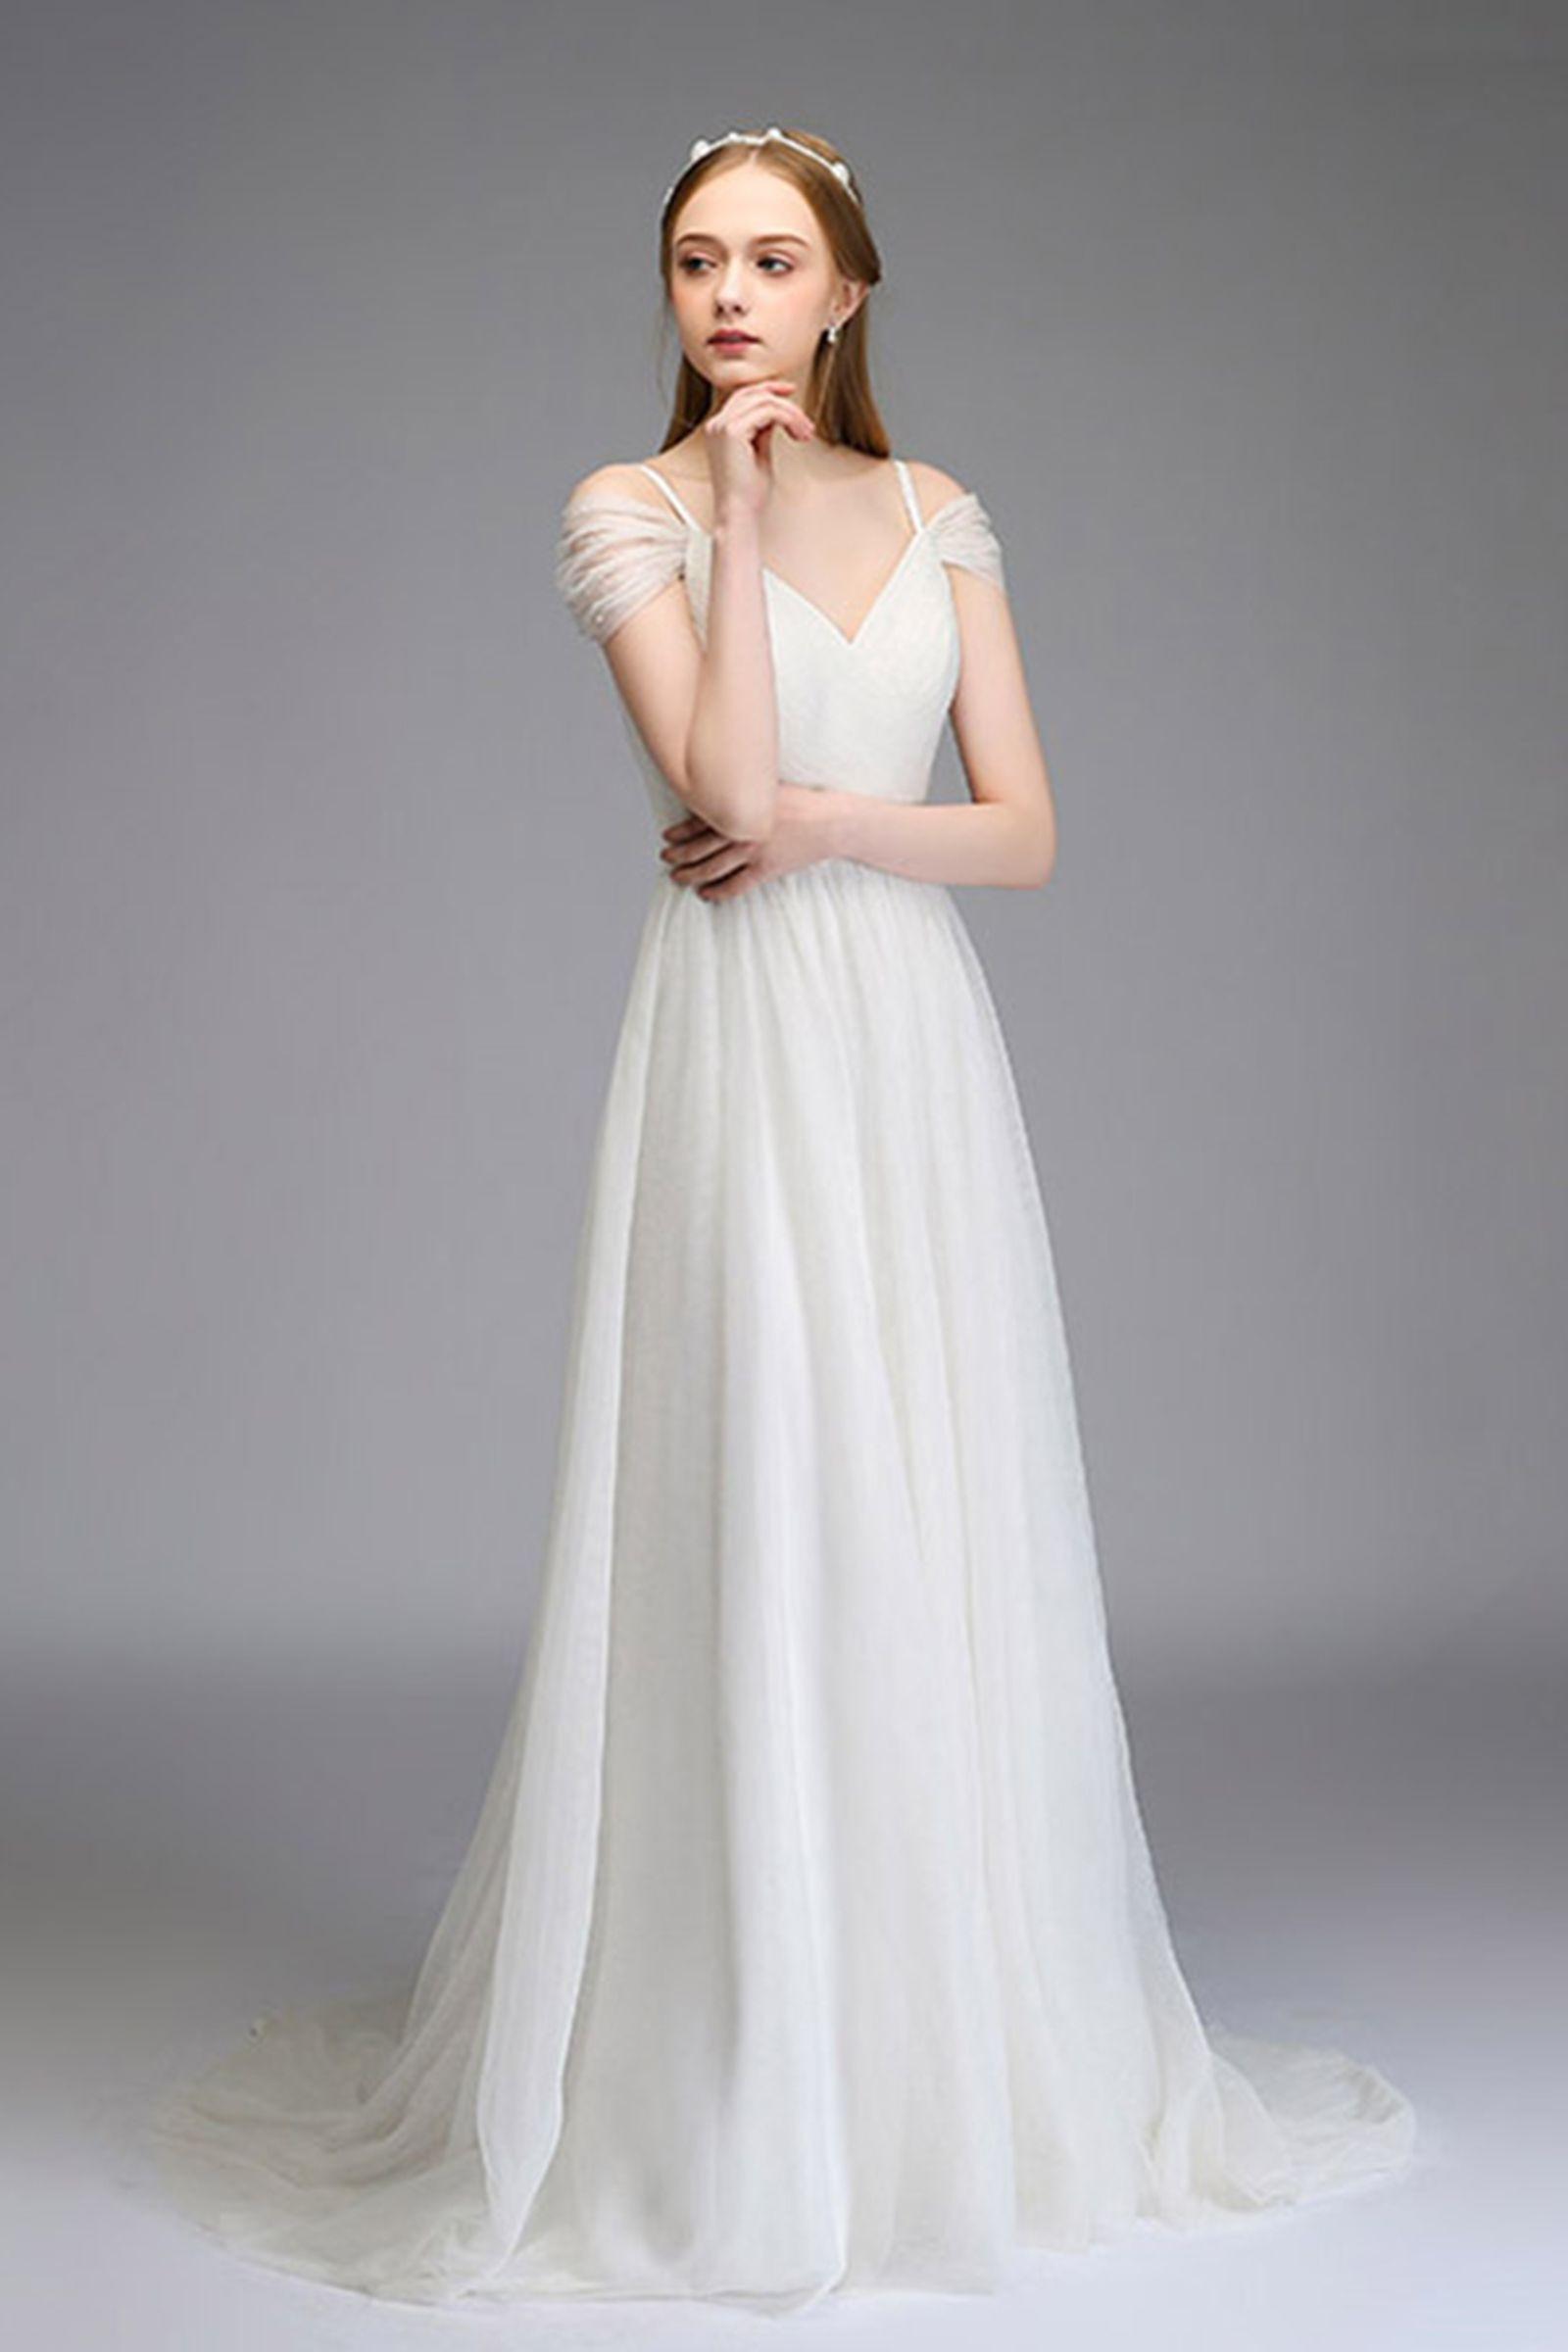 White Cross Sleeves Wedding Dress